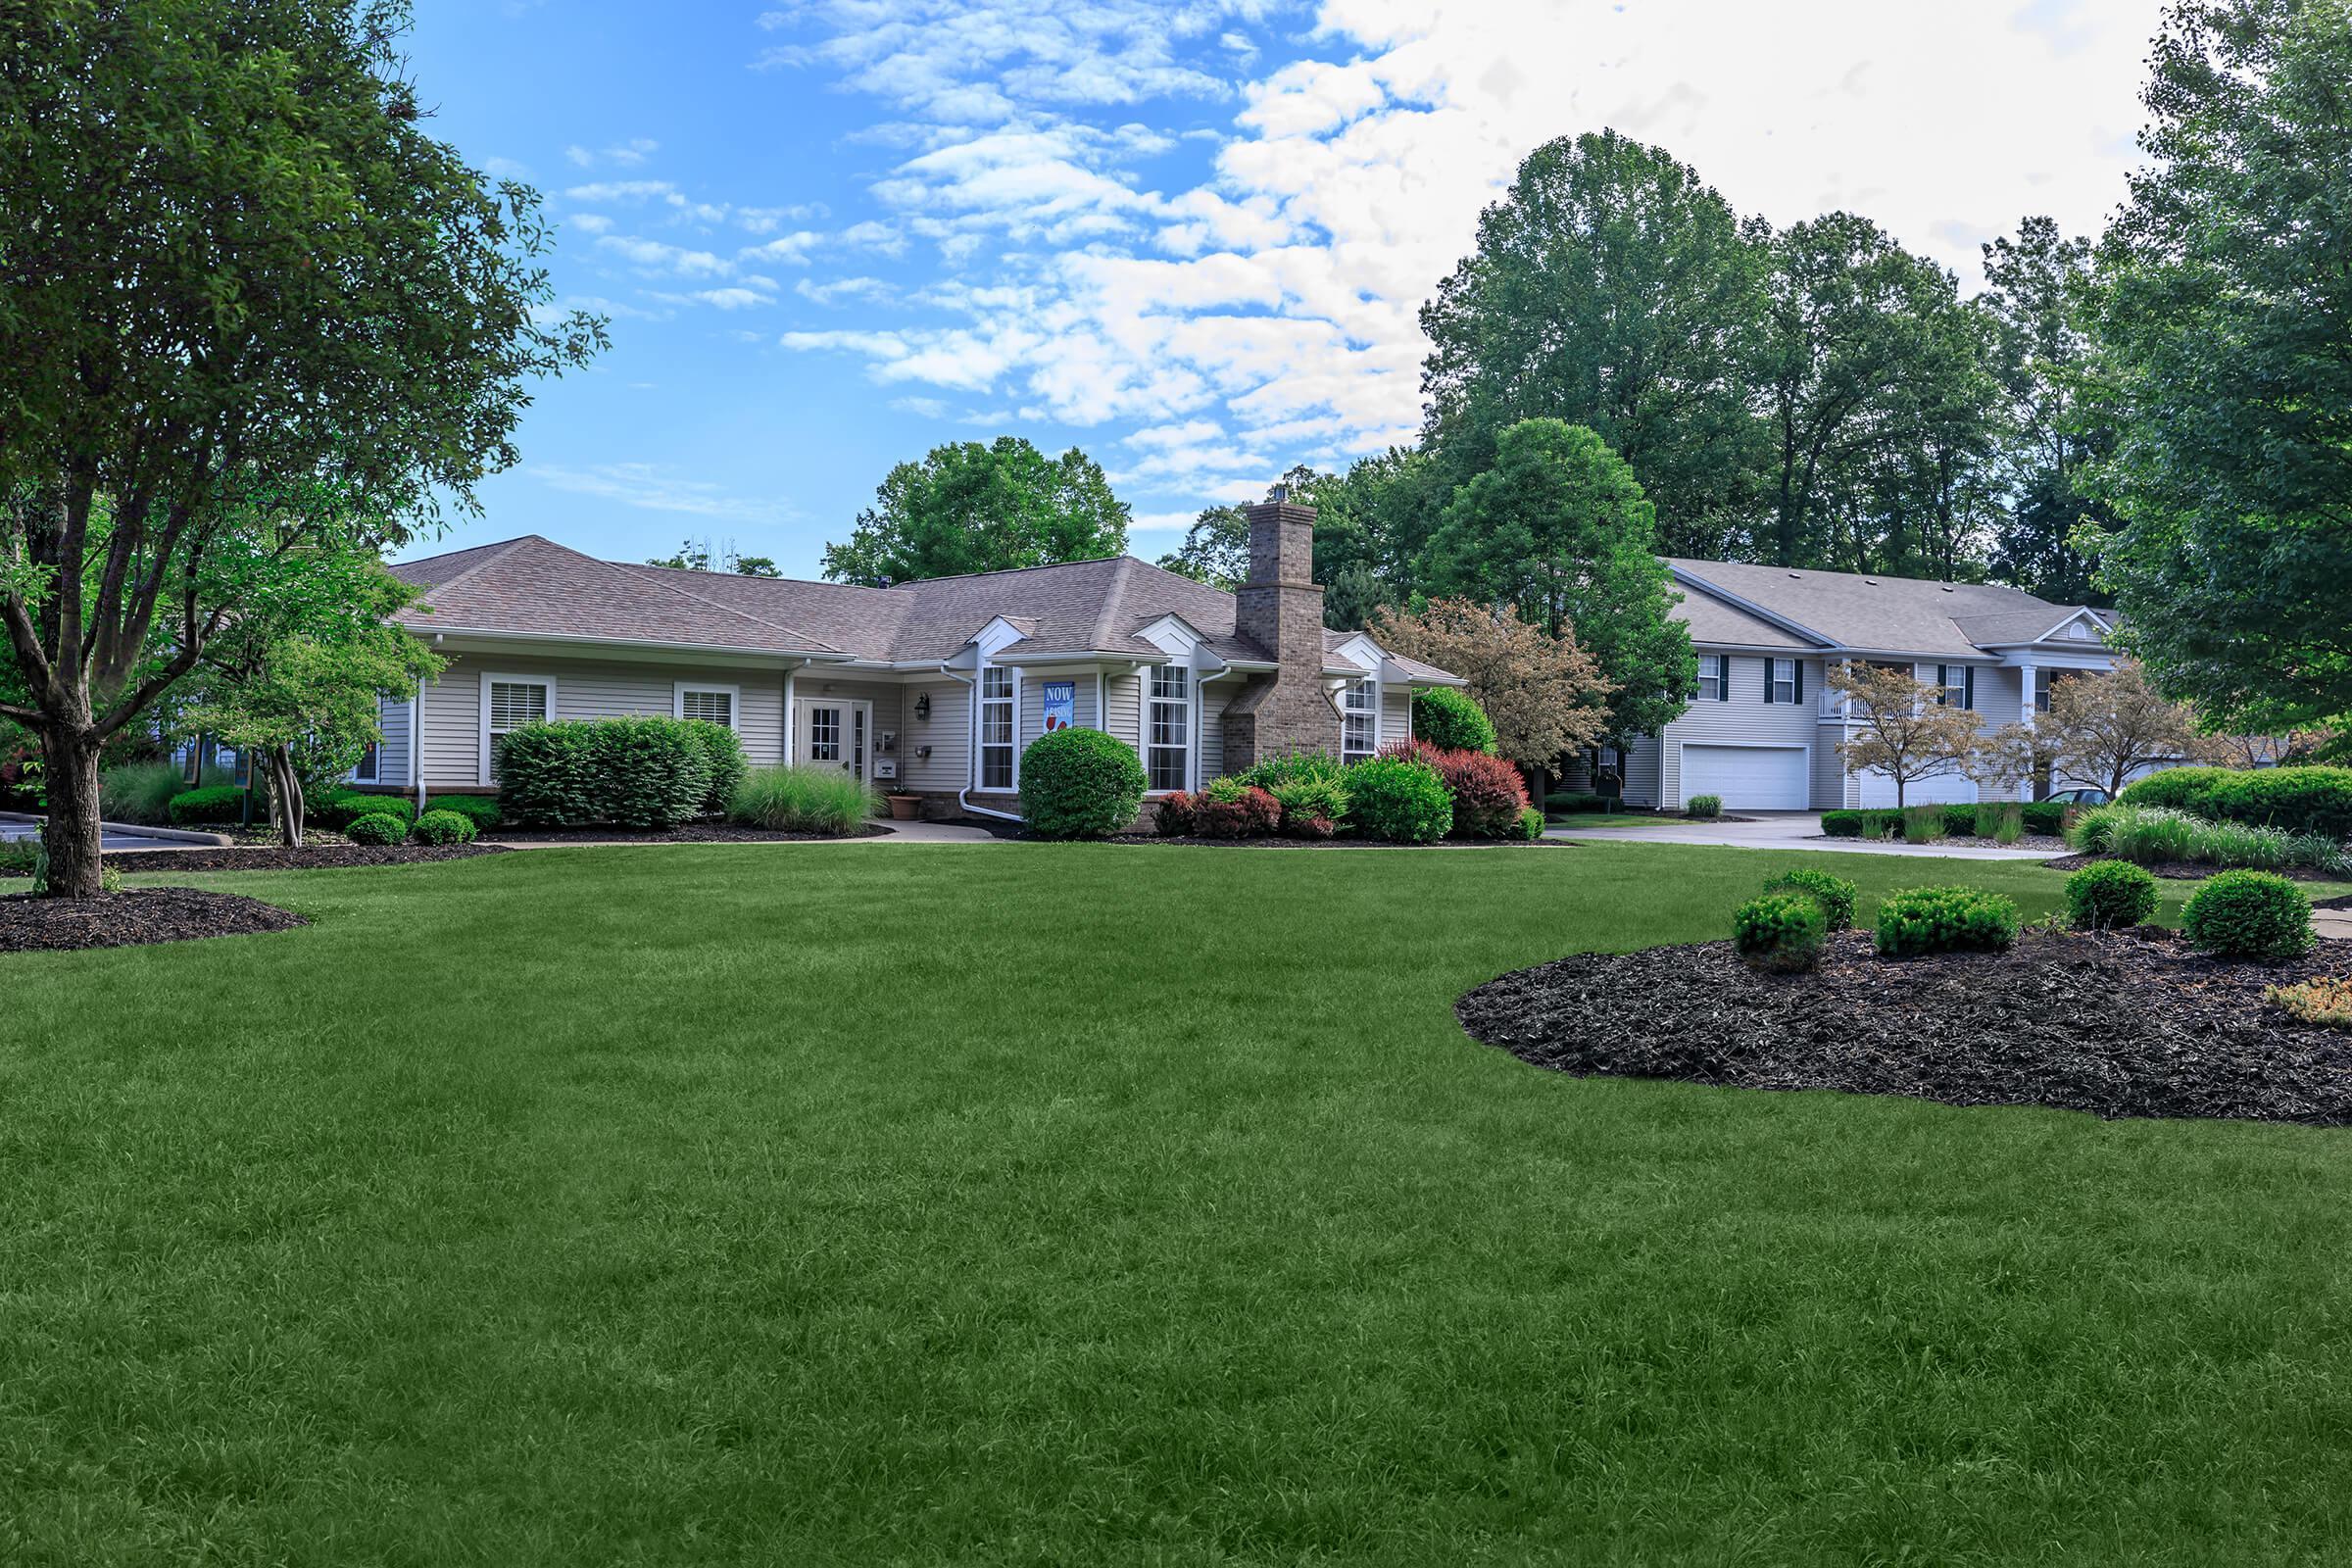 Picture of Lakeside Villas